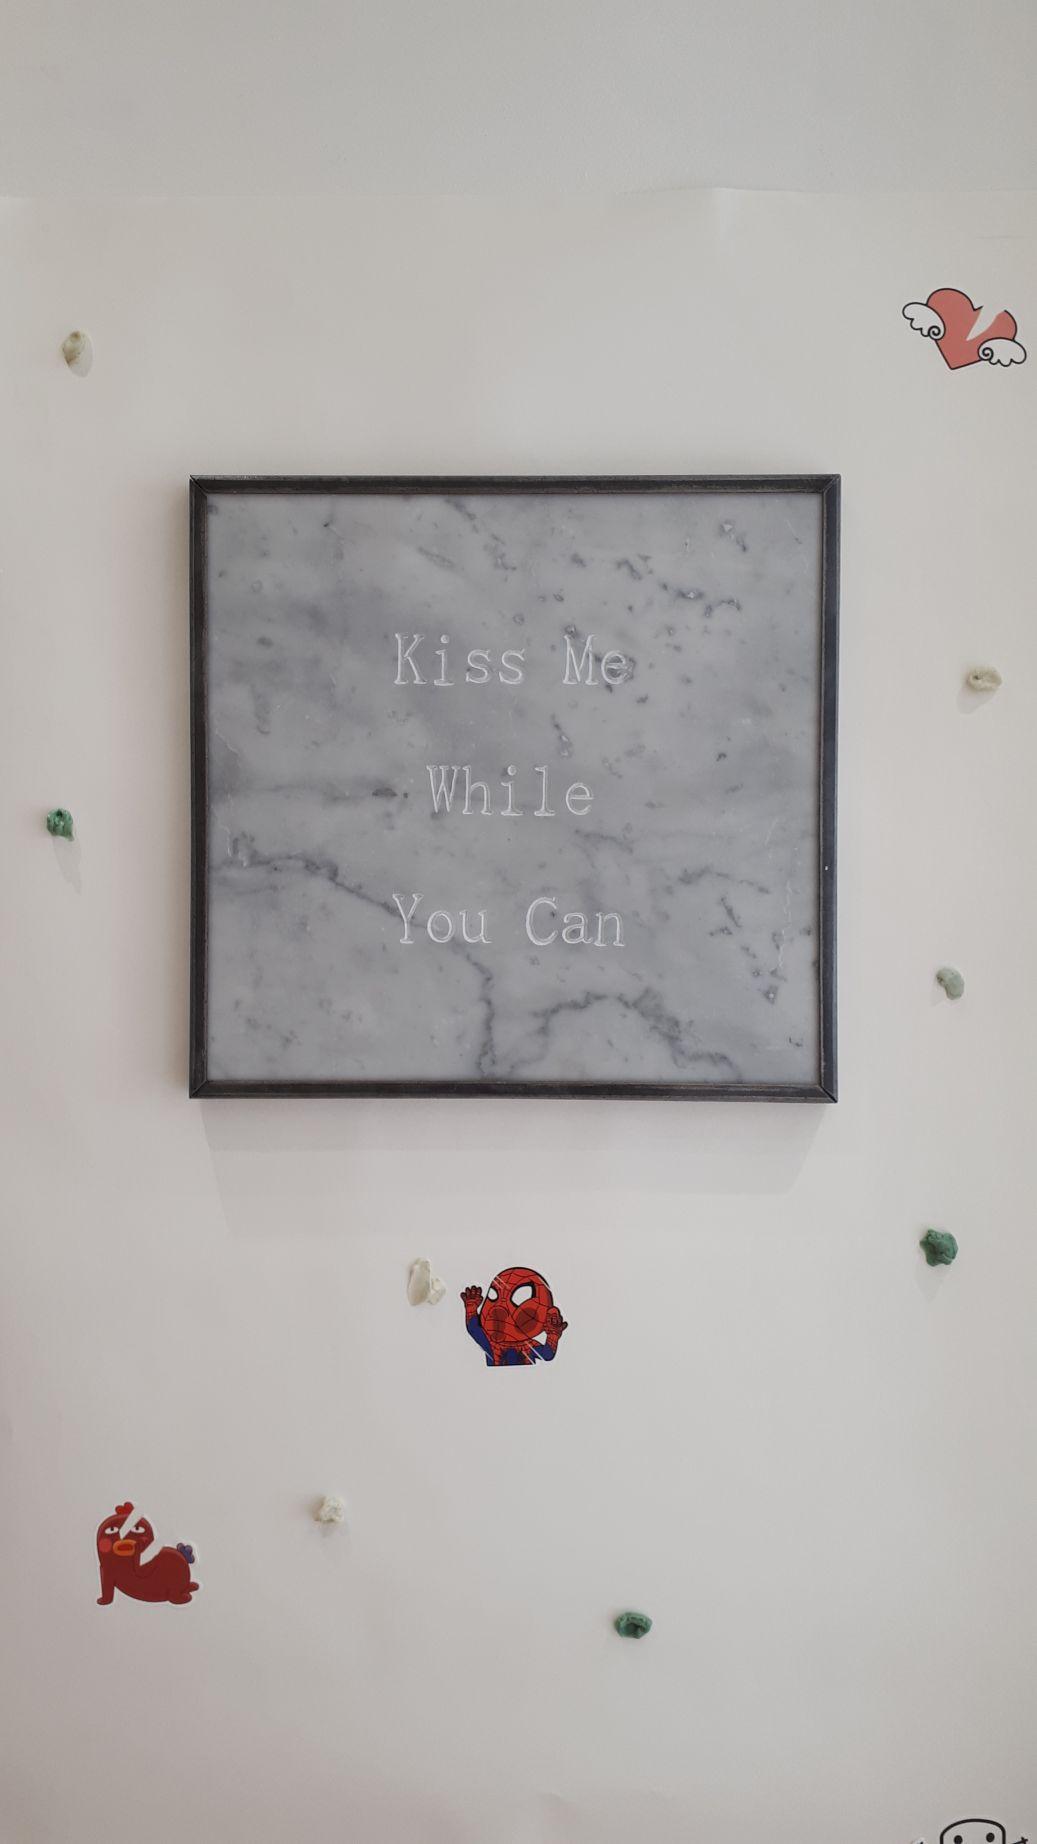 Kiss  Me While You Can (2017) - Anne Cecile Surga